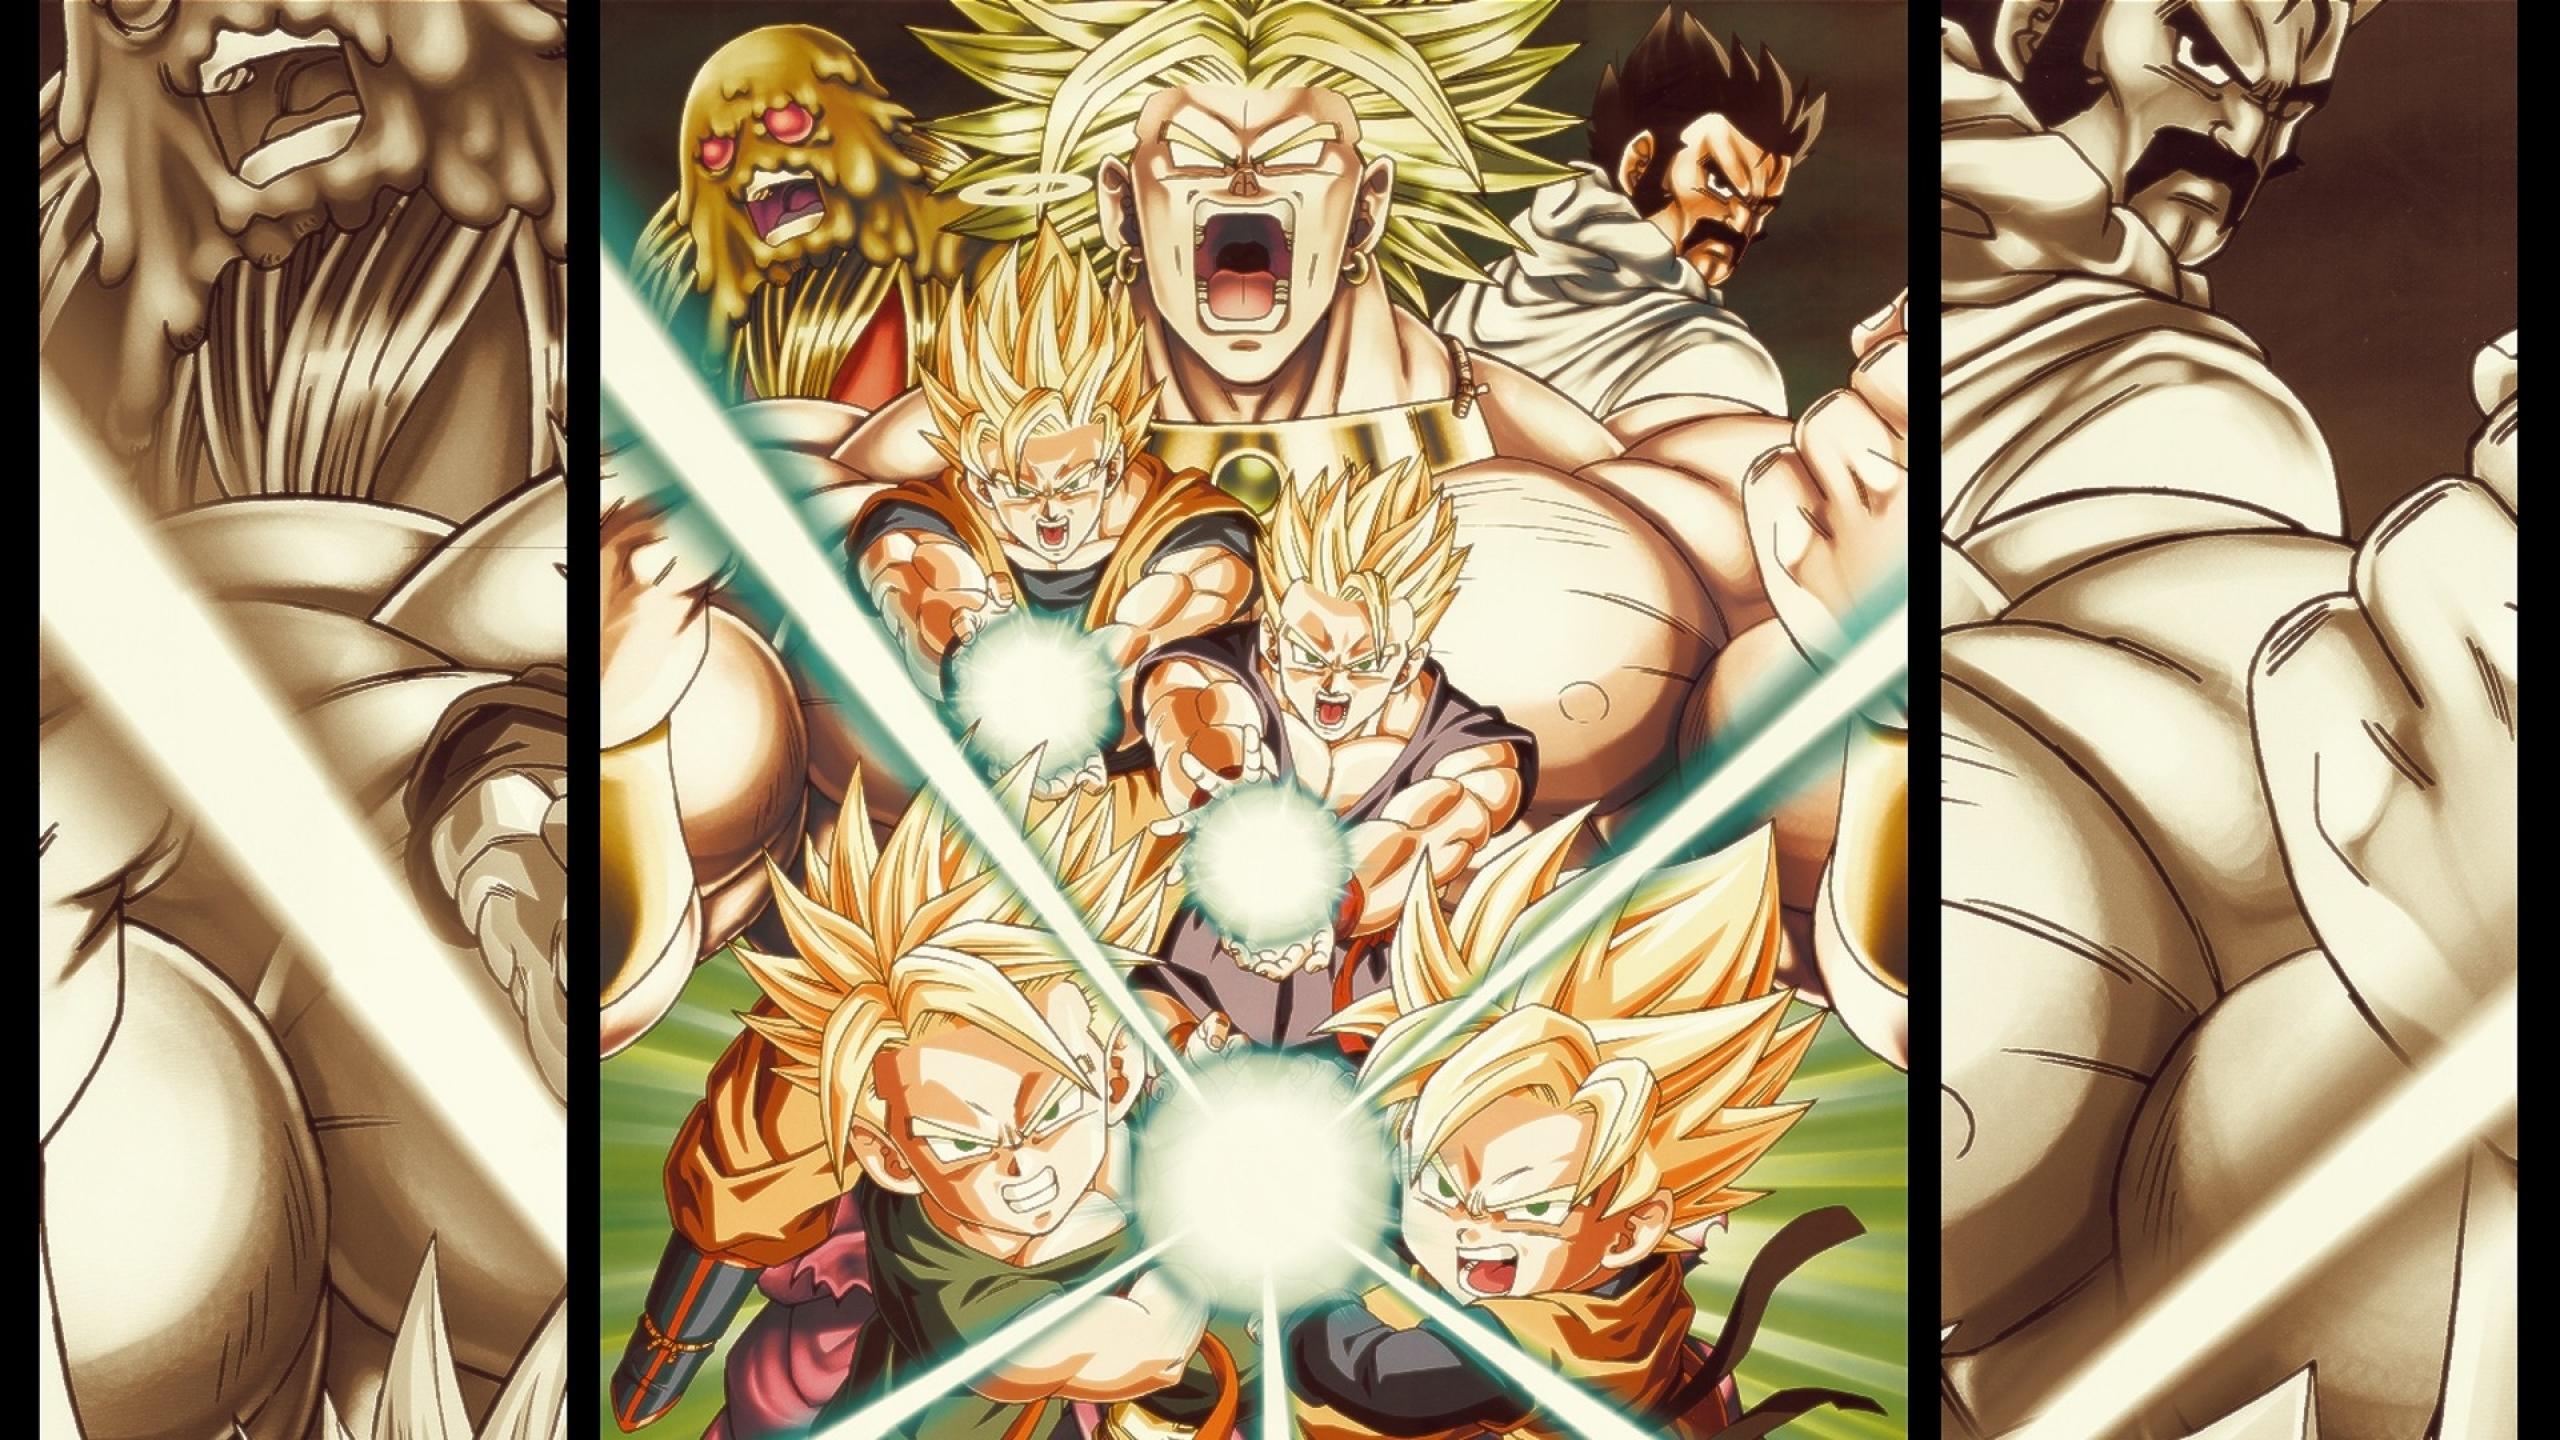 Goku Broly Gohan Trunks Goten 2560x1440